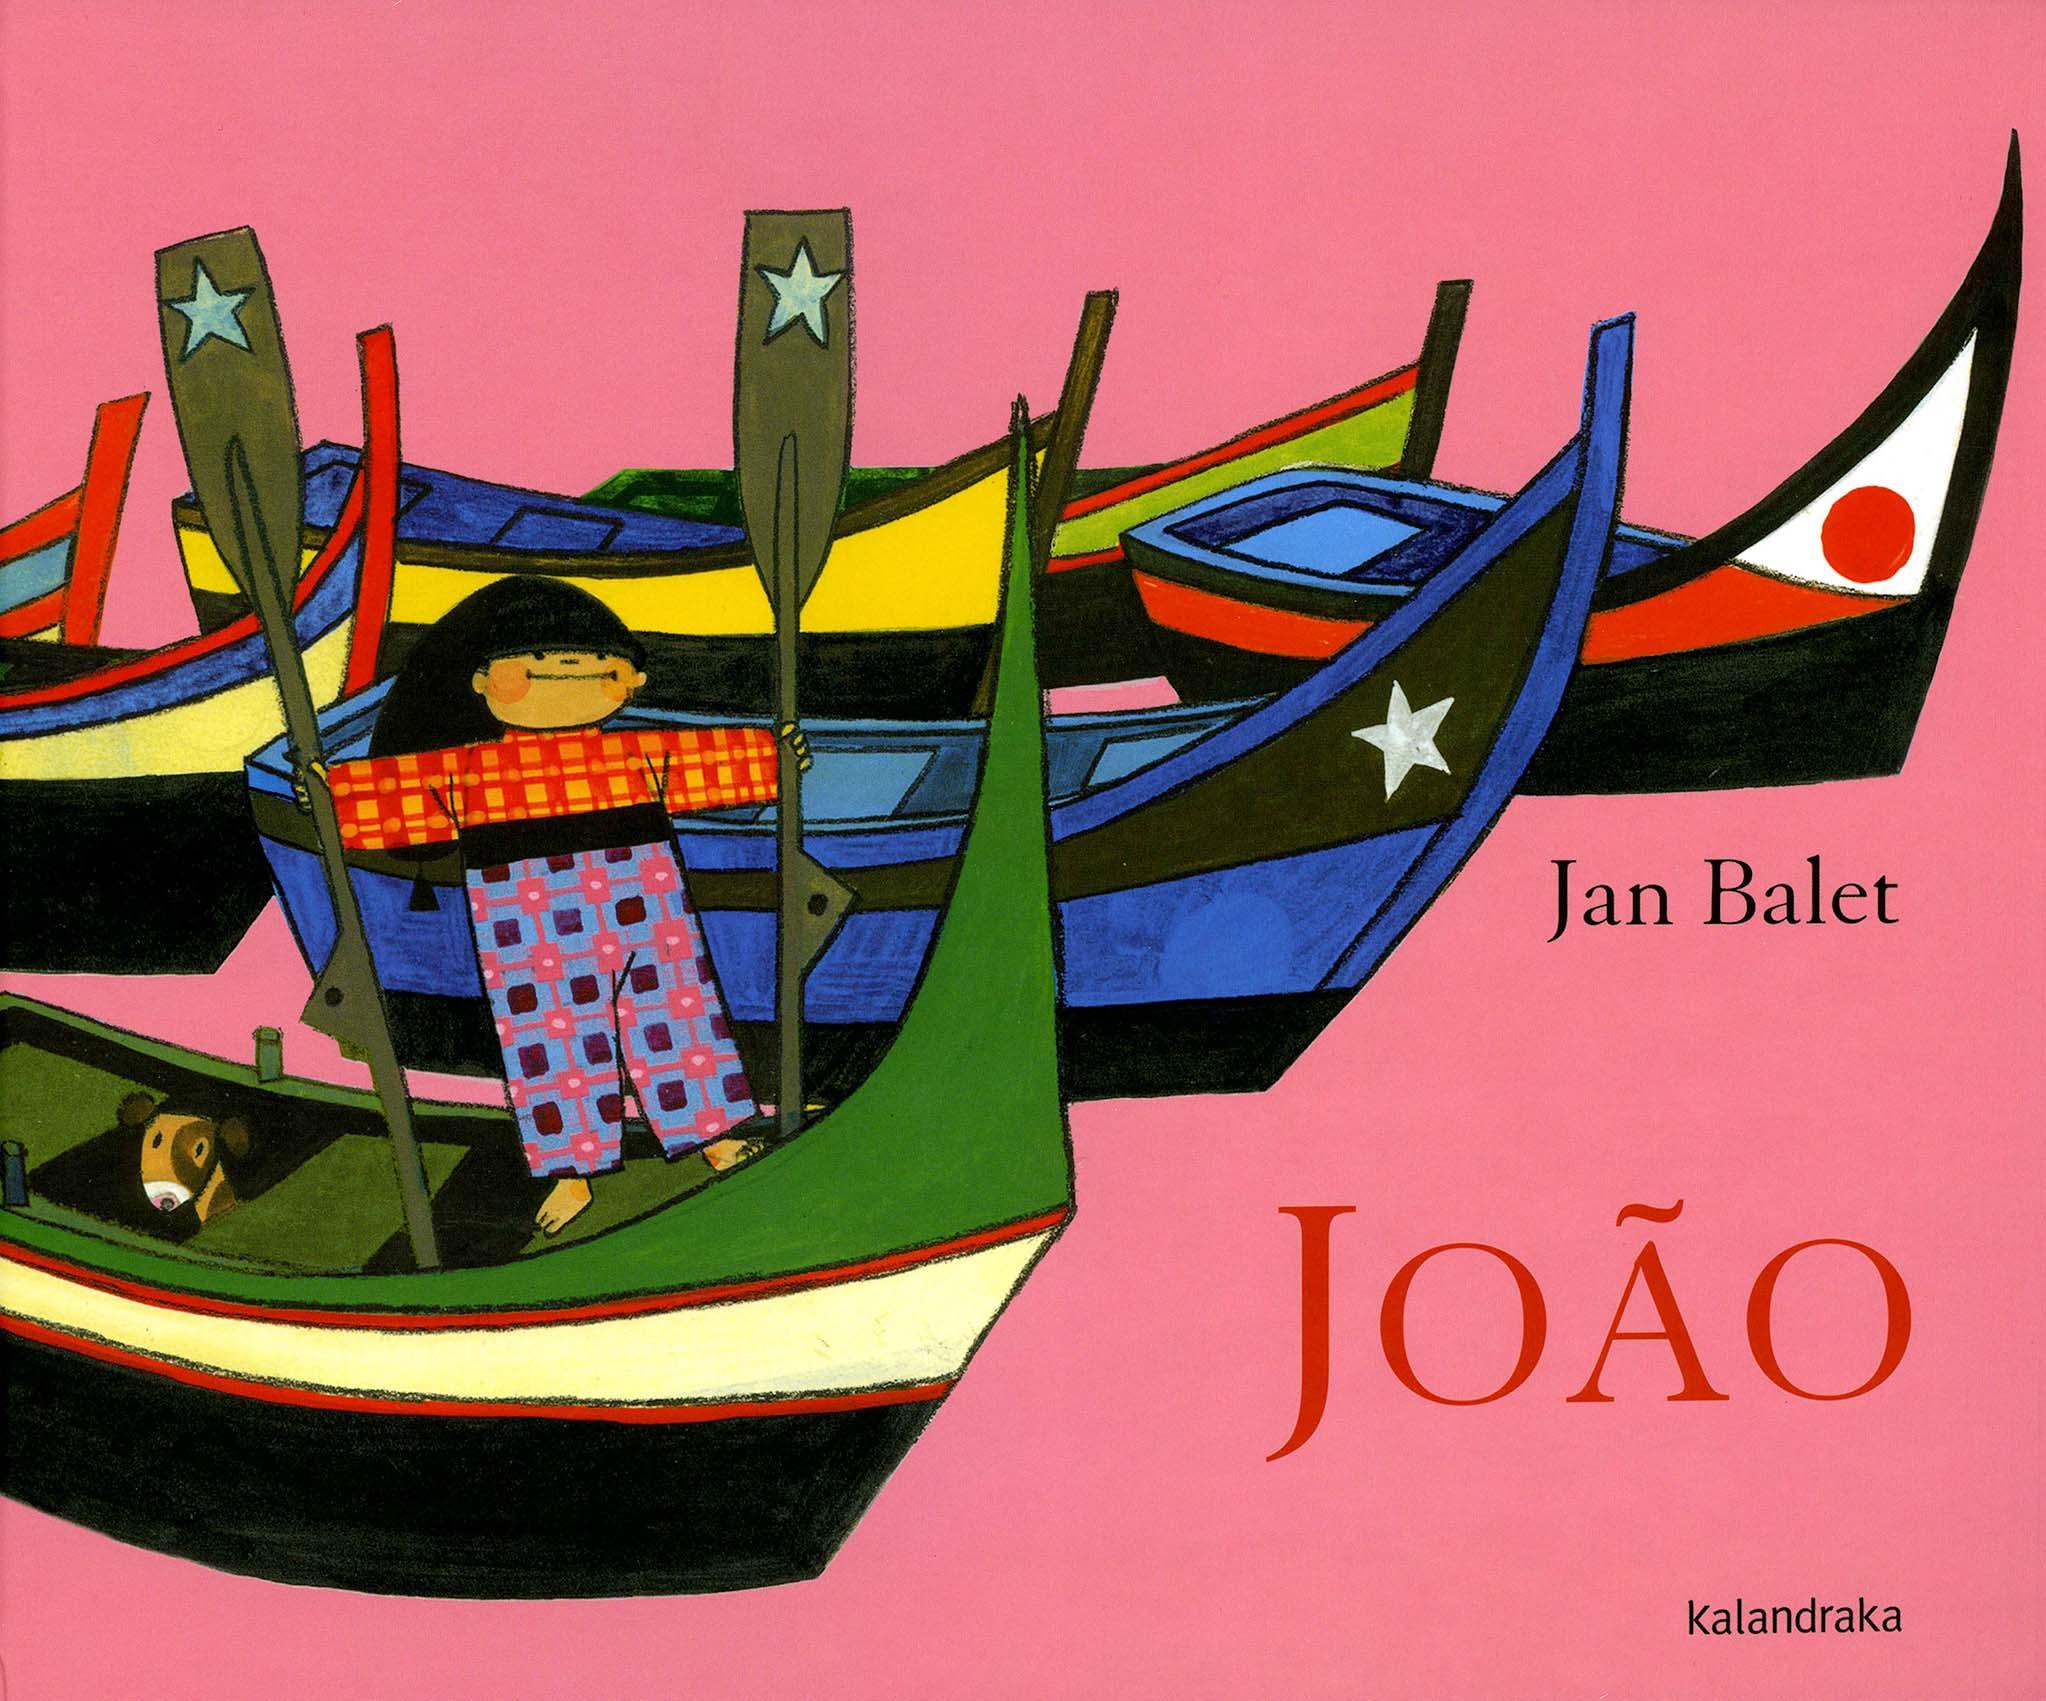 Joao-front-jacket-cover-web.jpg